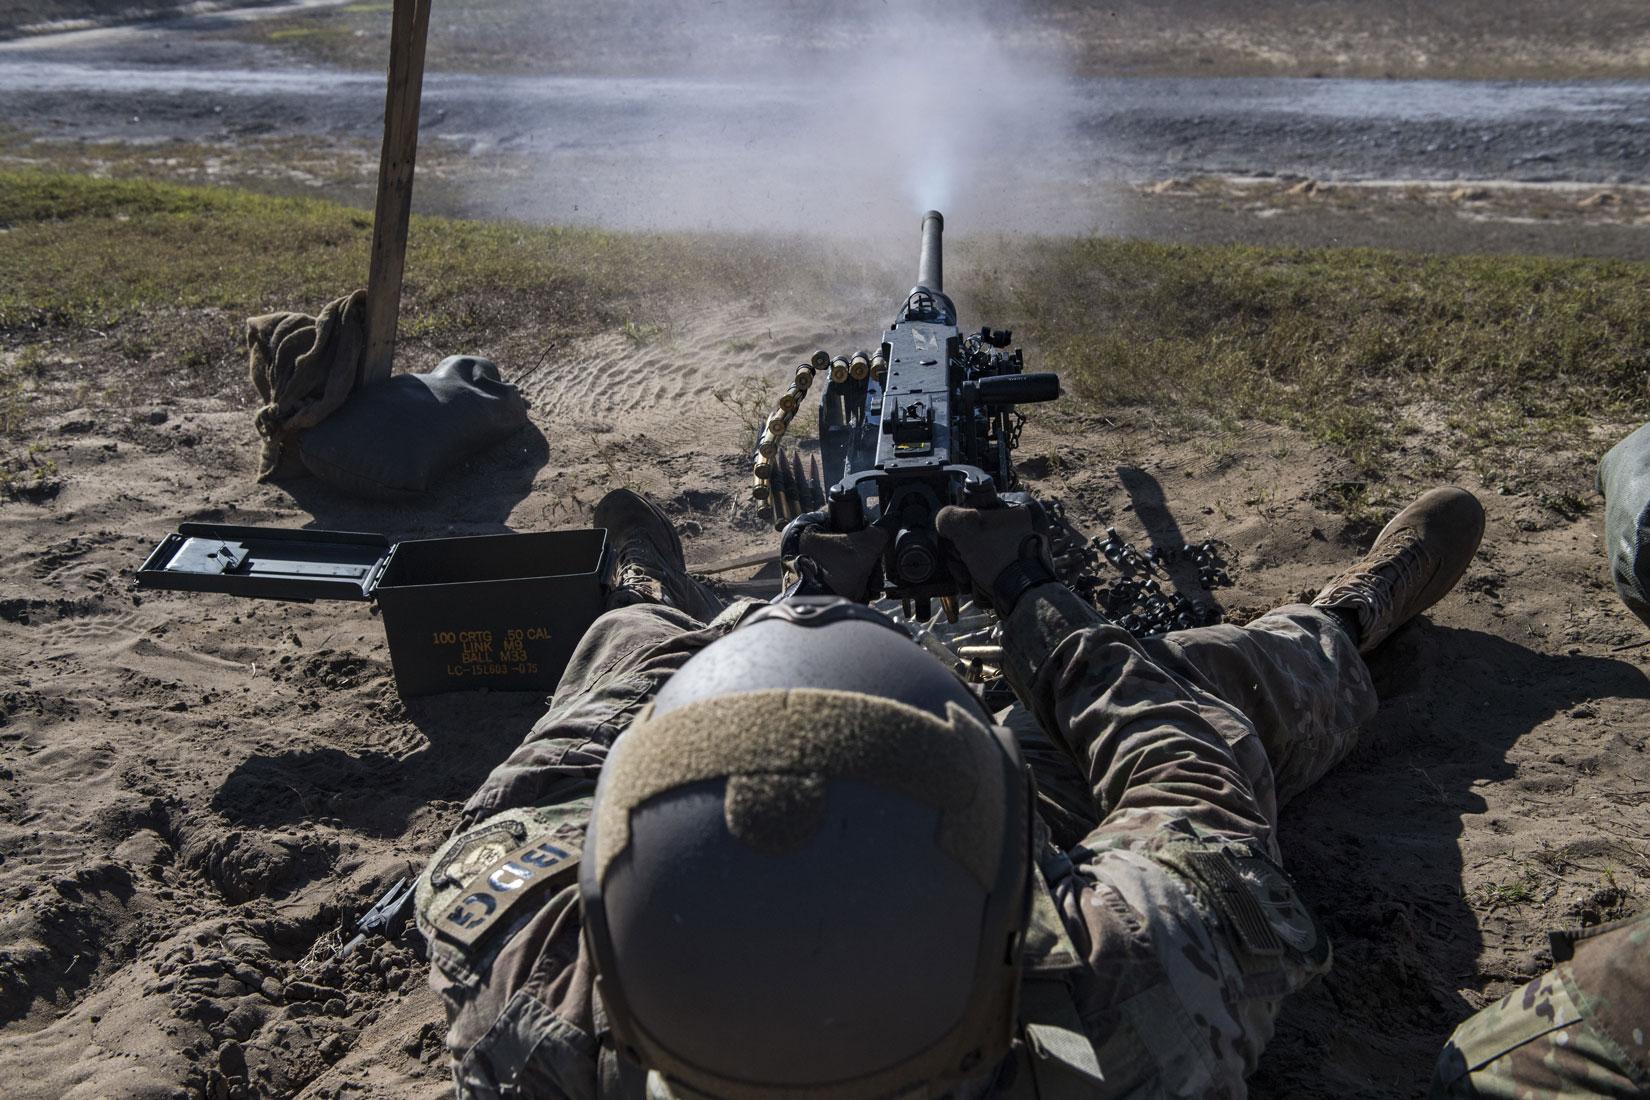 United States Air Force Gunner Staff Sgt. Richard Murkin, 823d Base Defense Squadron fireteam member, fires a .50 Caliber M2 machine gun, during a heavy weapons qualification.